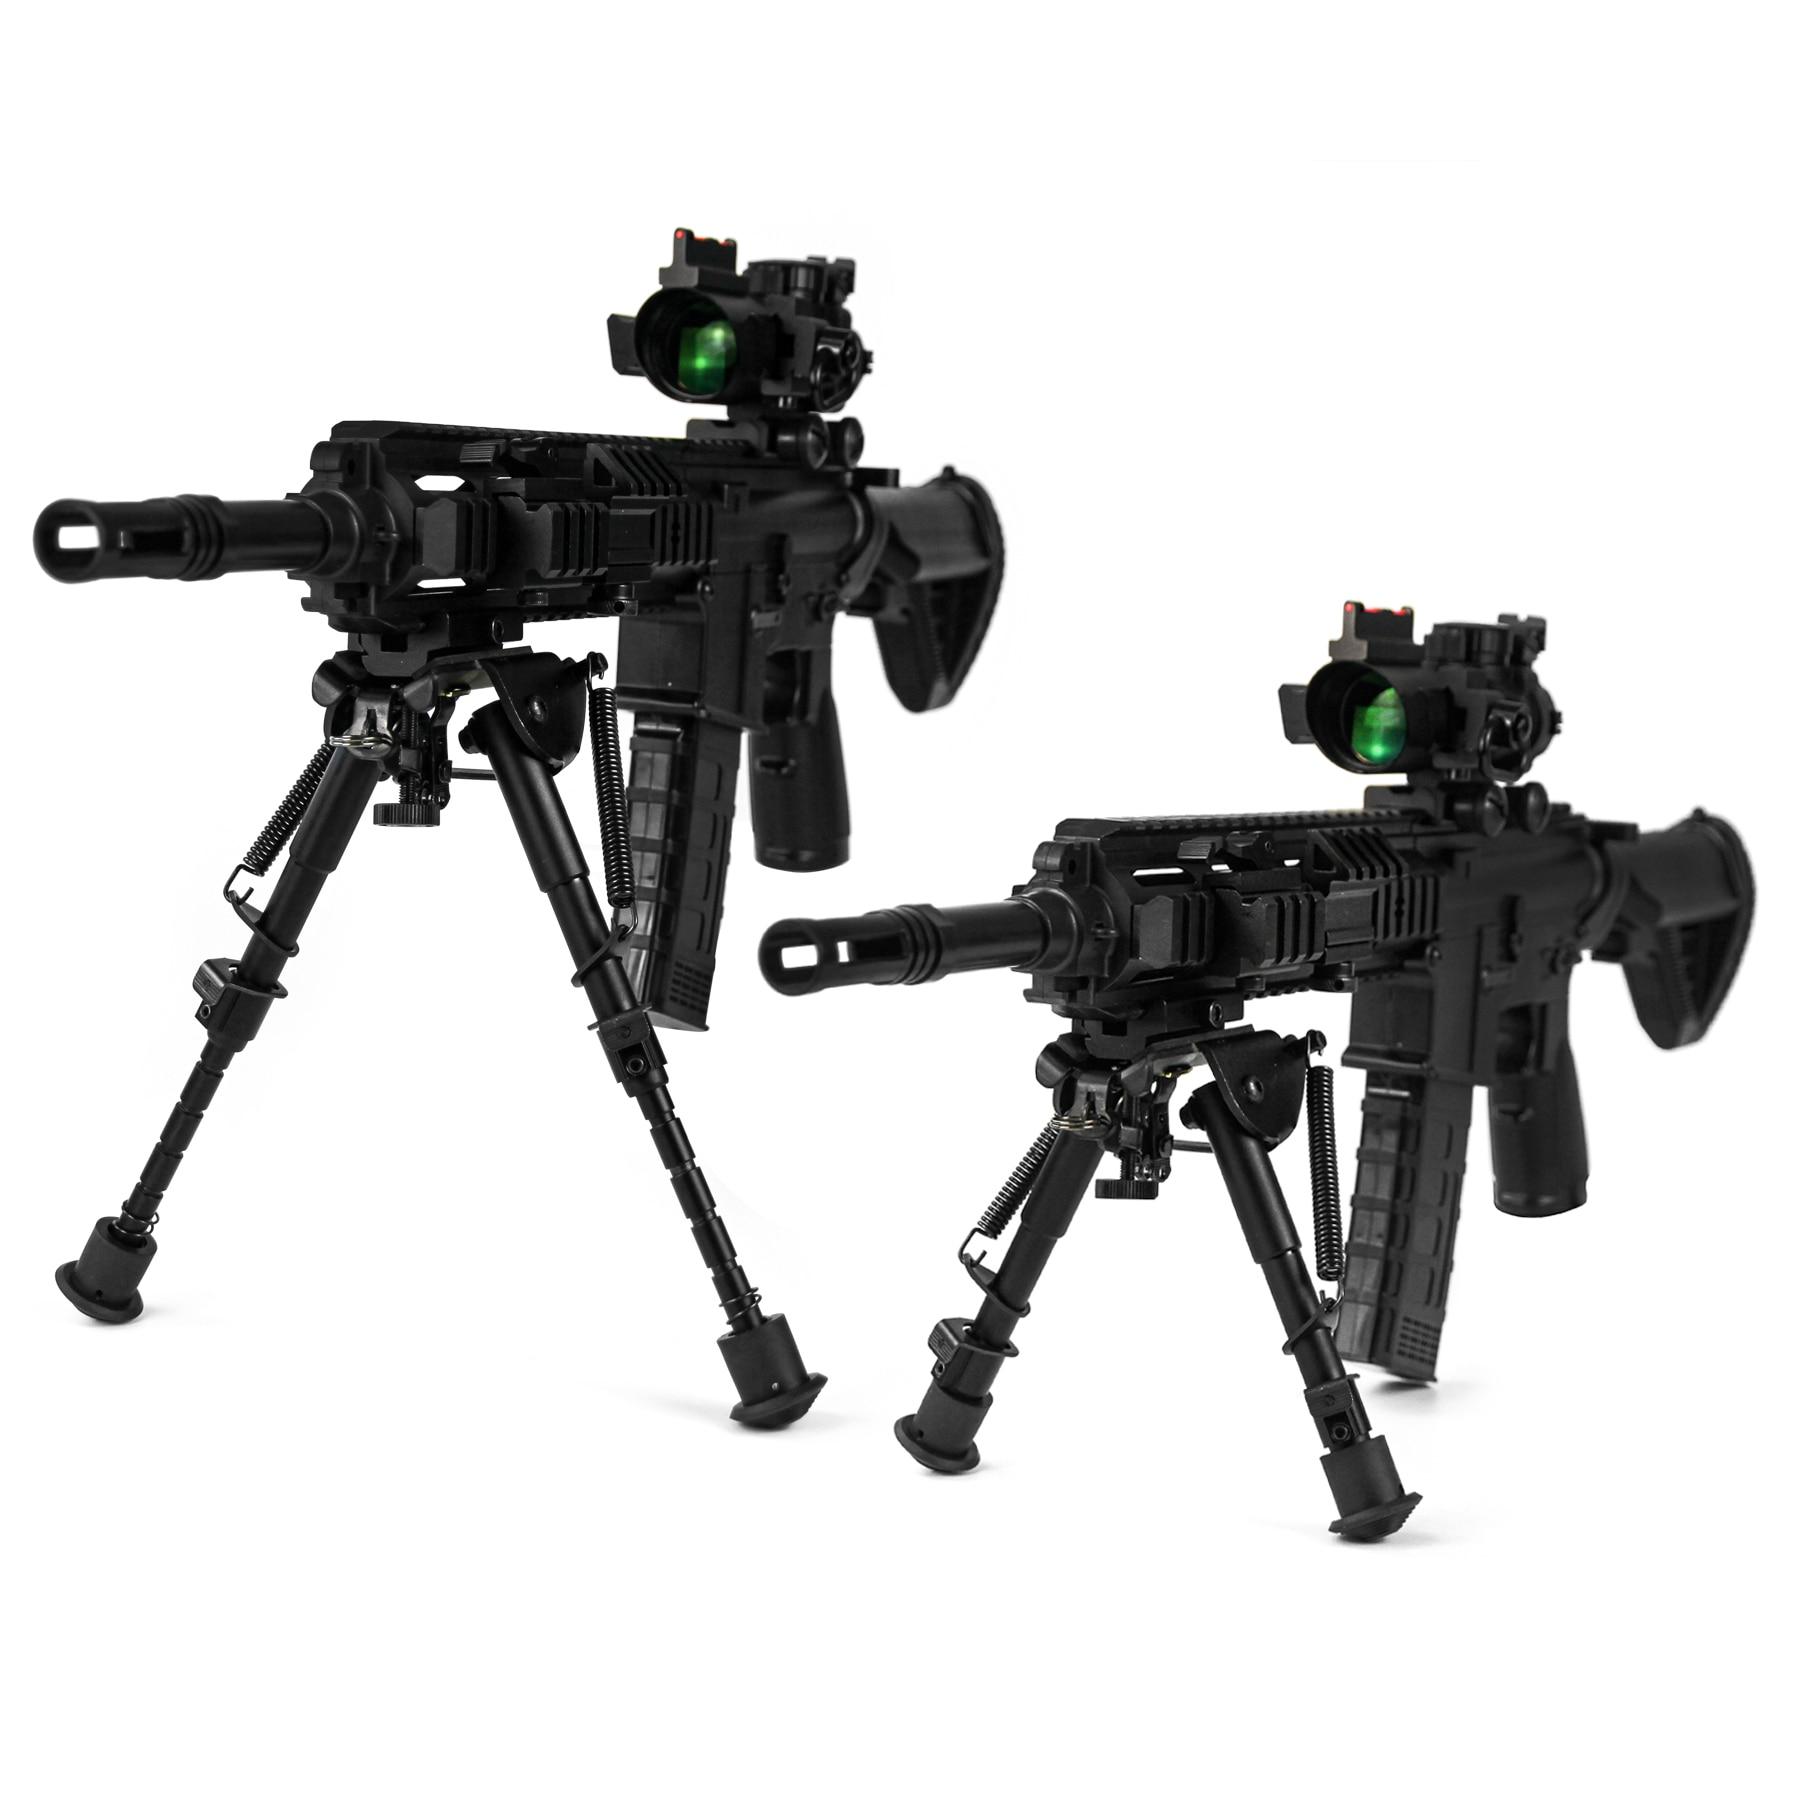 2 X Aluminium QD Tactical Black Spring Loaded Rifle Sling Crochets AIRSOFT AIRGUN